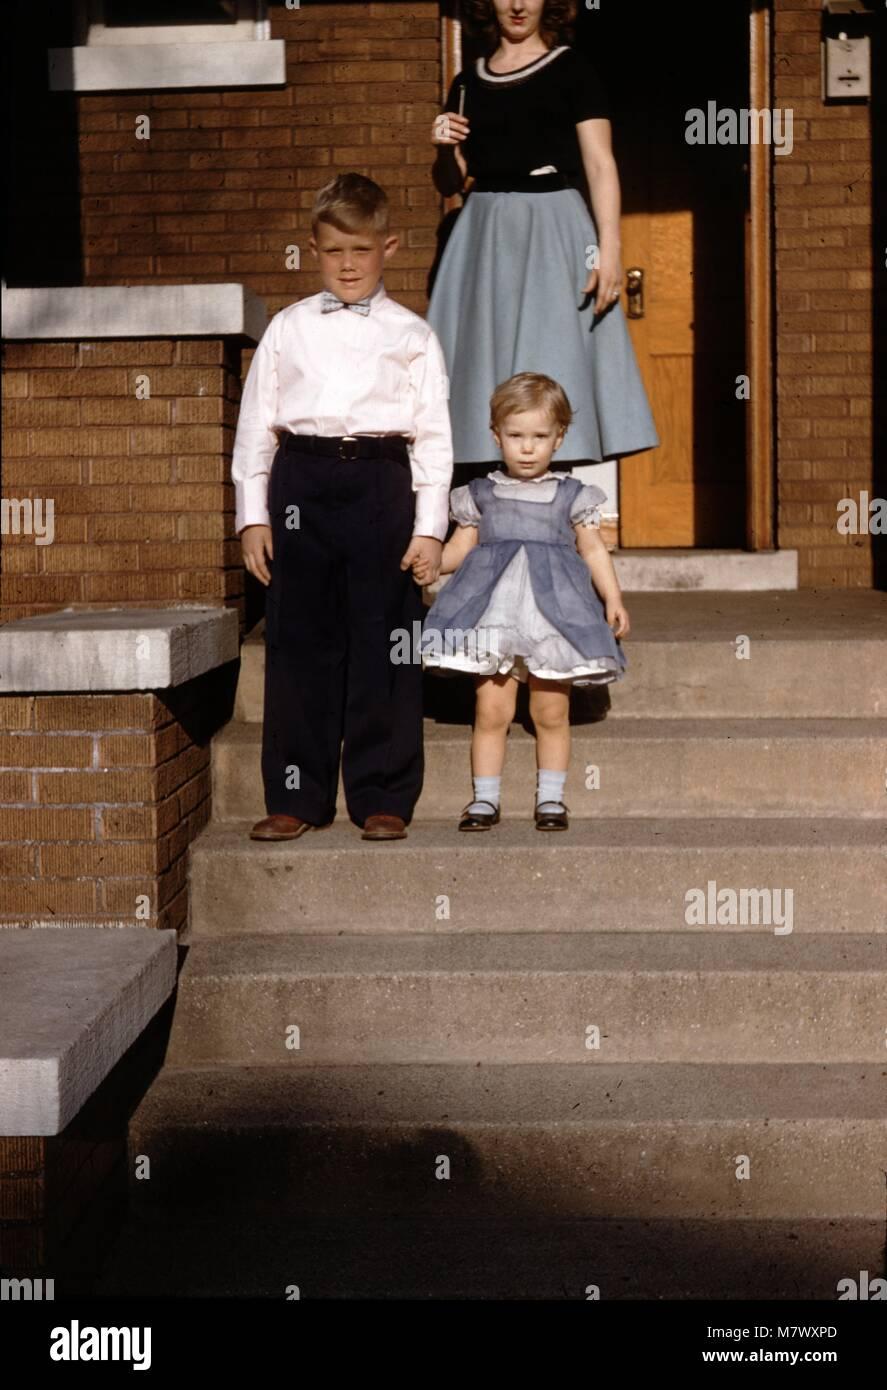 Vintage archival photograph taken in 1960 - Stock Image